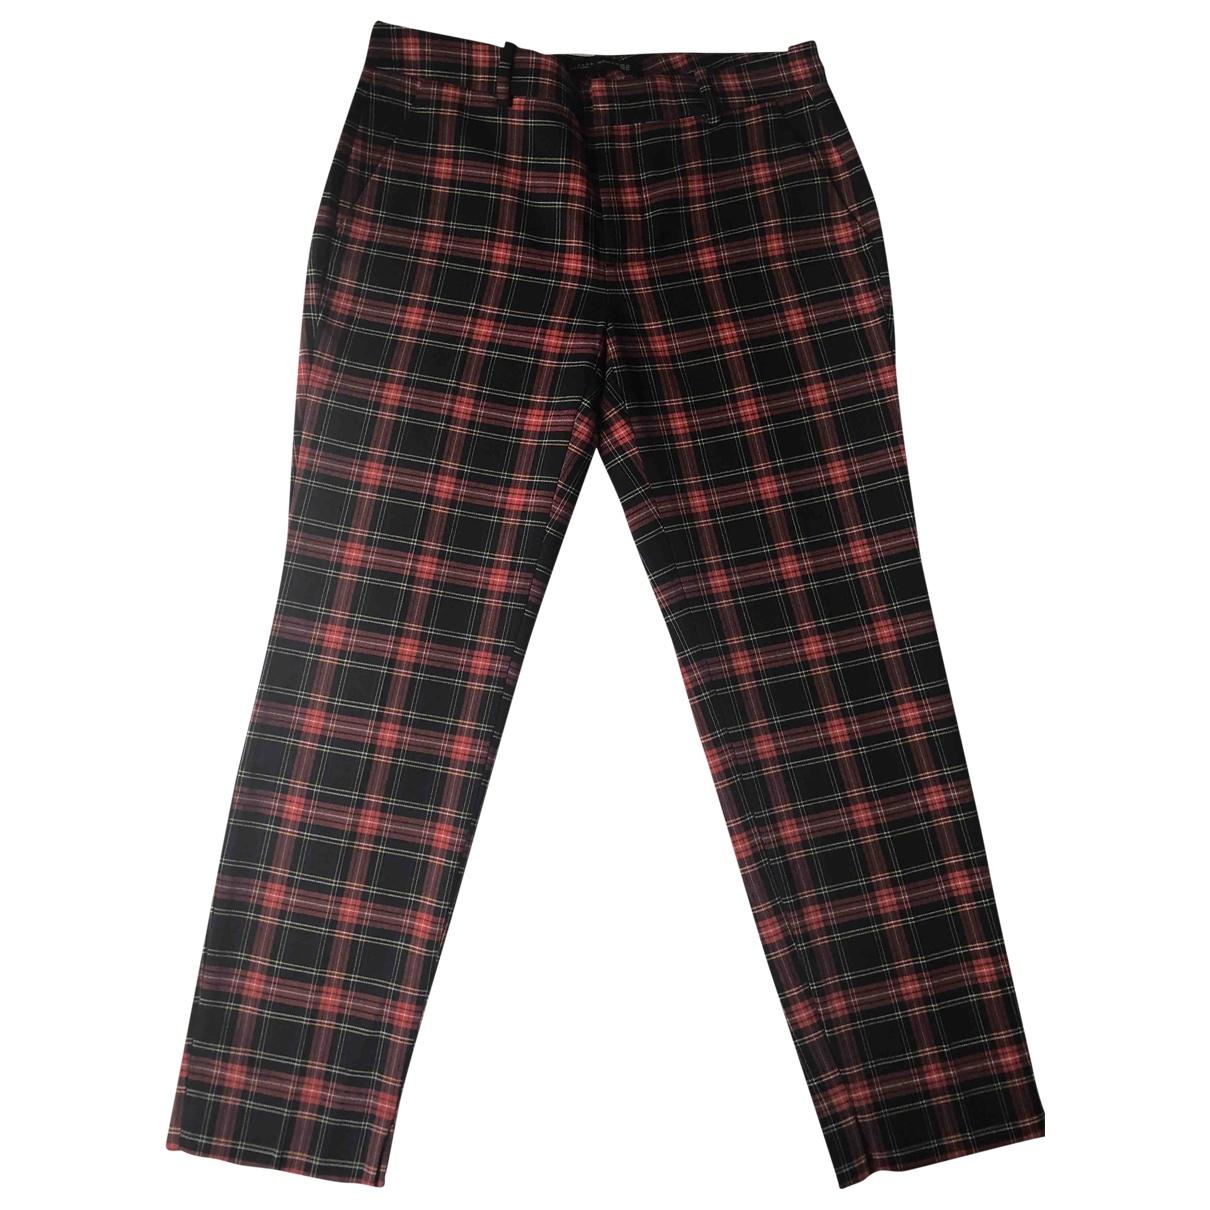 Zara \N Black Trousers for Women 36 FR